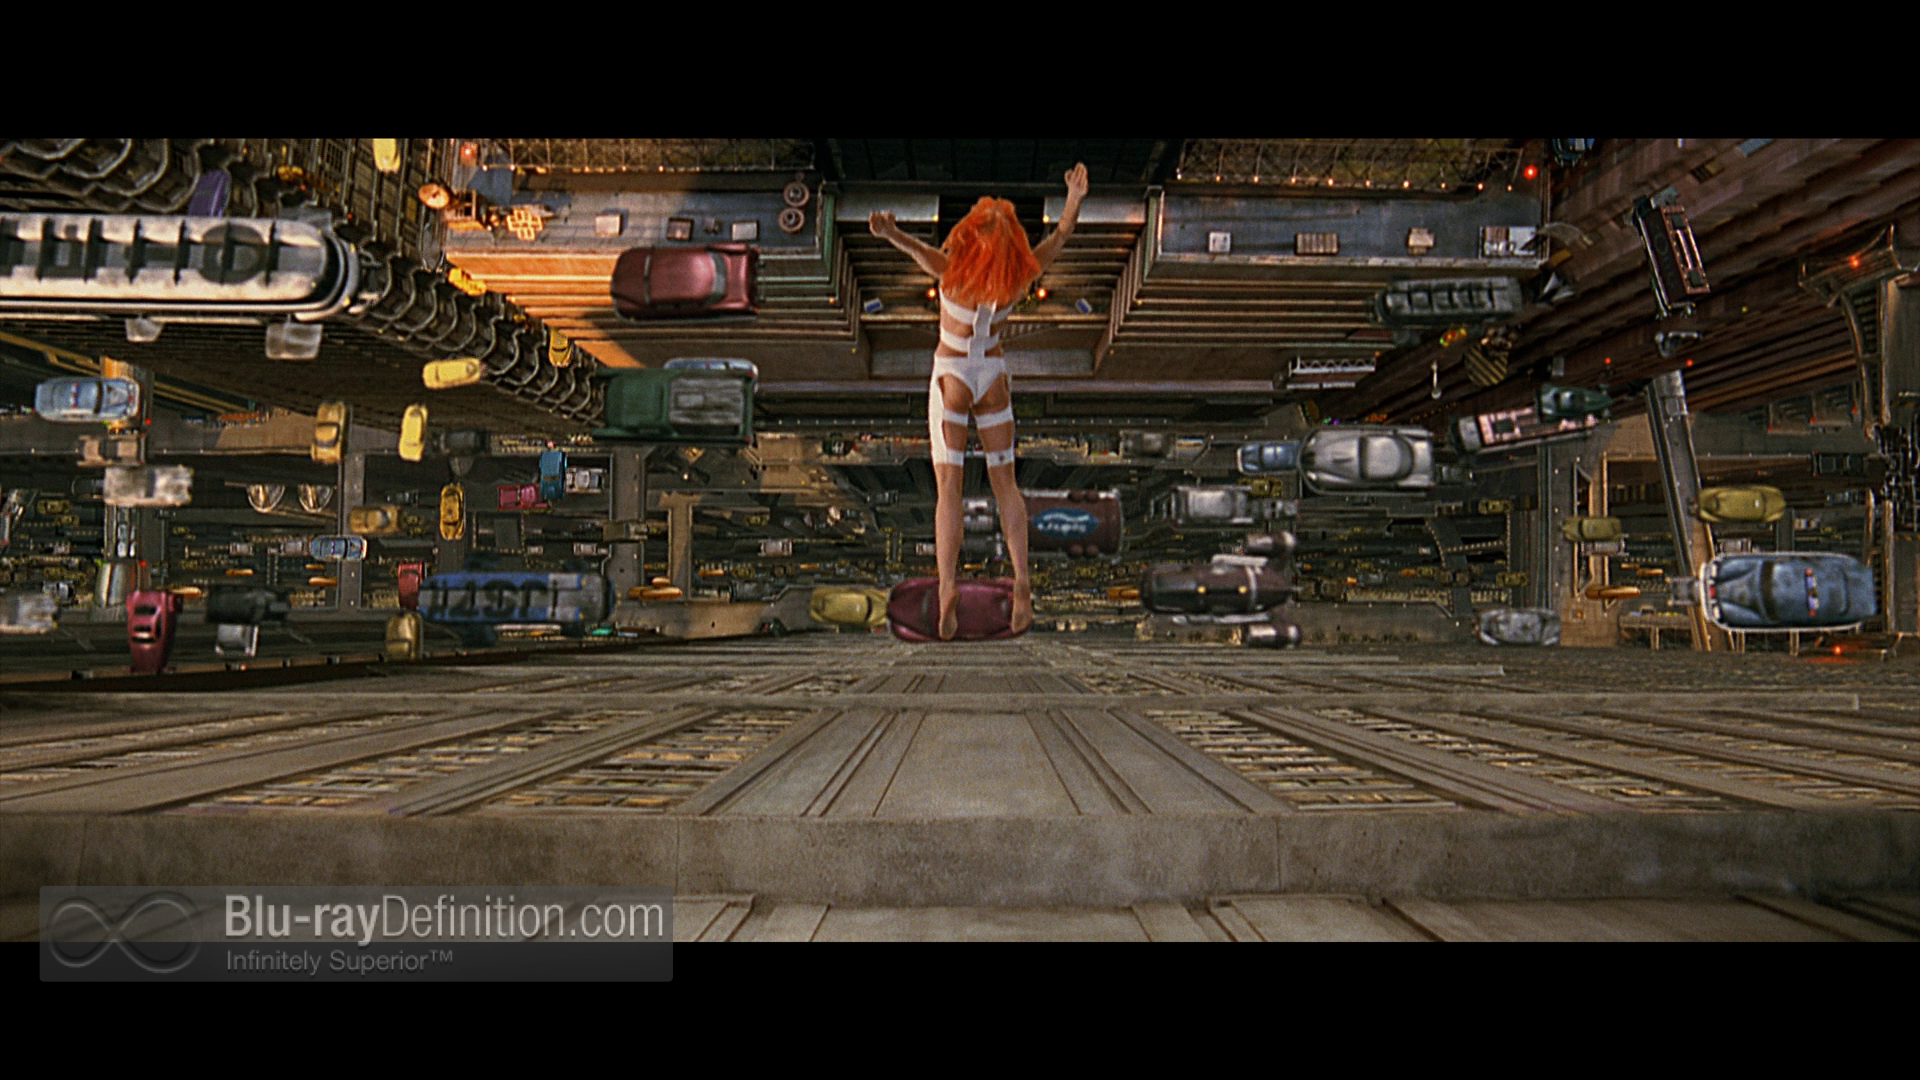 The Fifth Element Wallpaper 15   1920 X 1080 stmednet 1920x1080